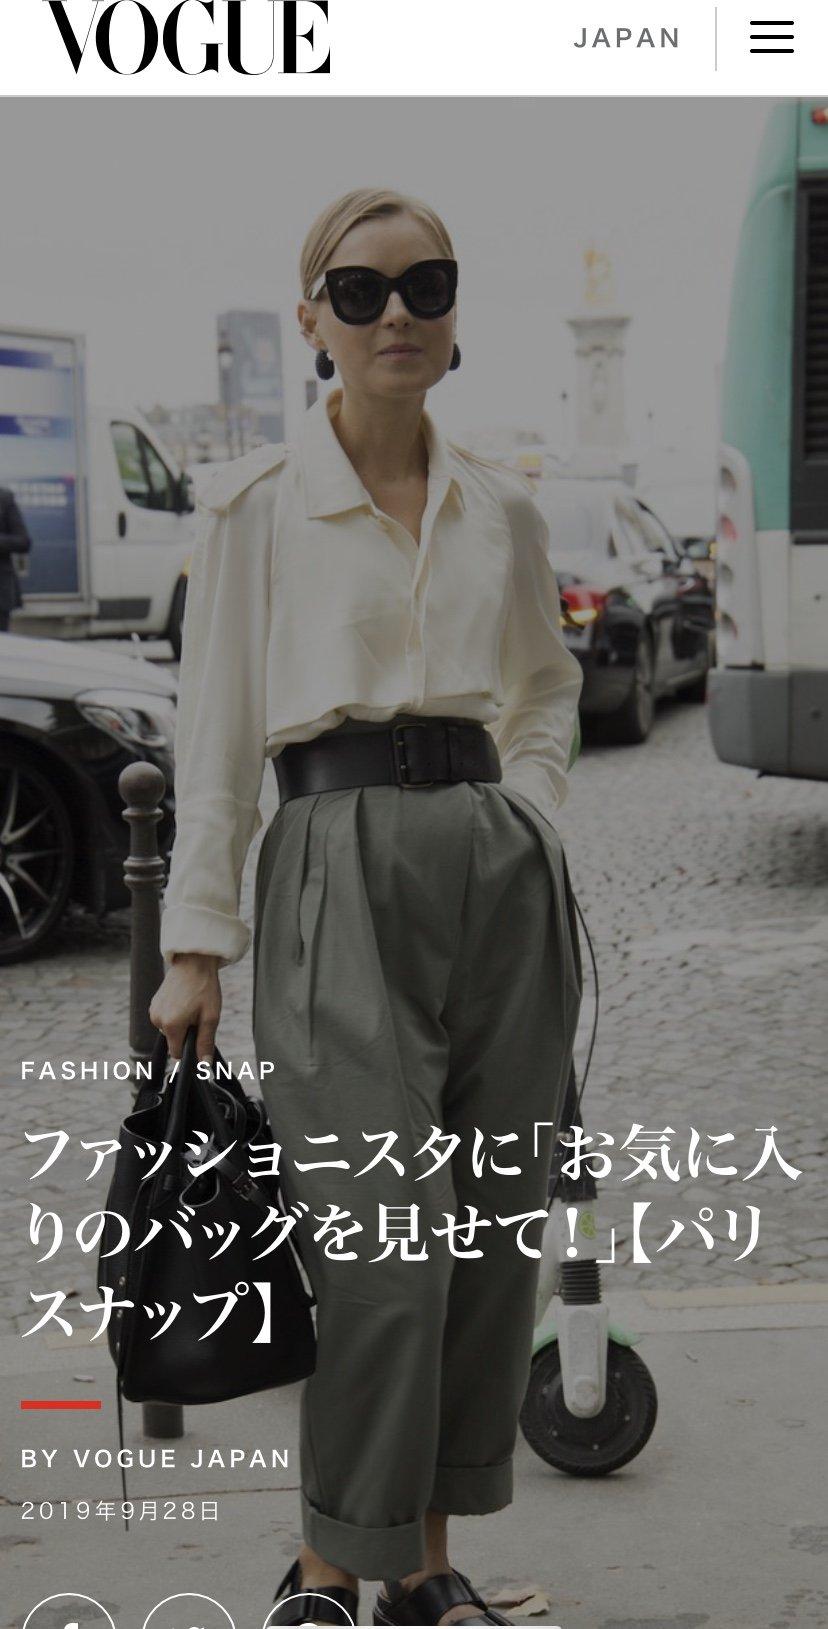 Vogue Japan – Fashion Snap |03.10.2019